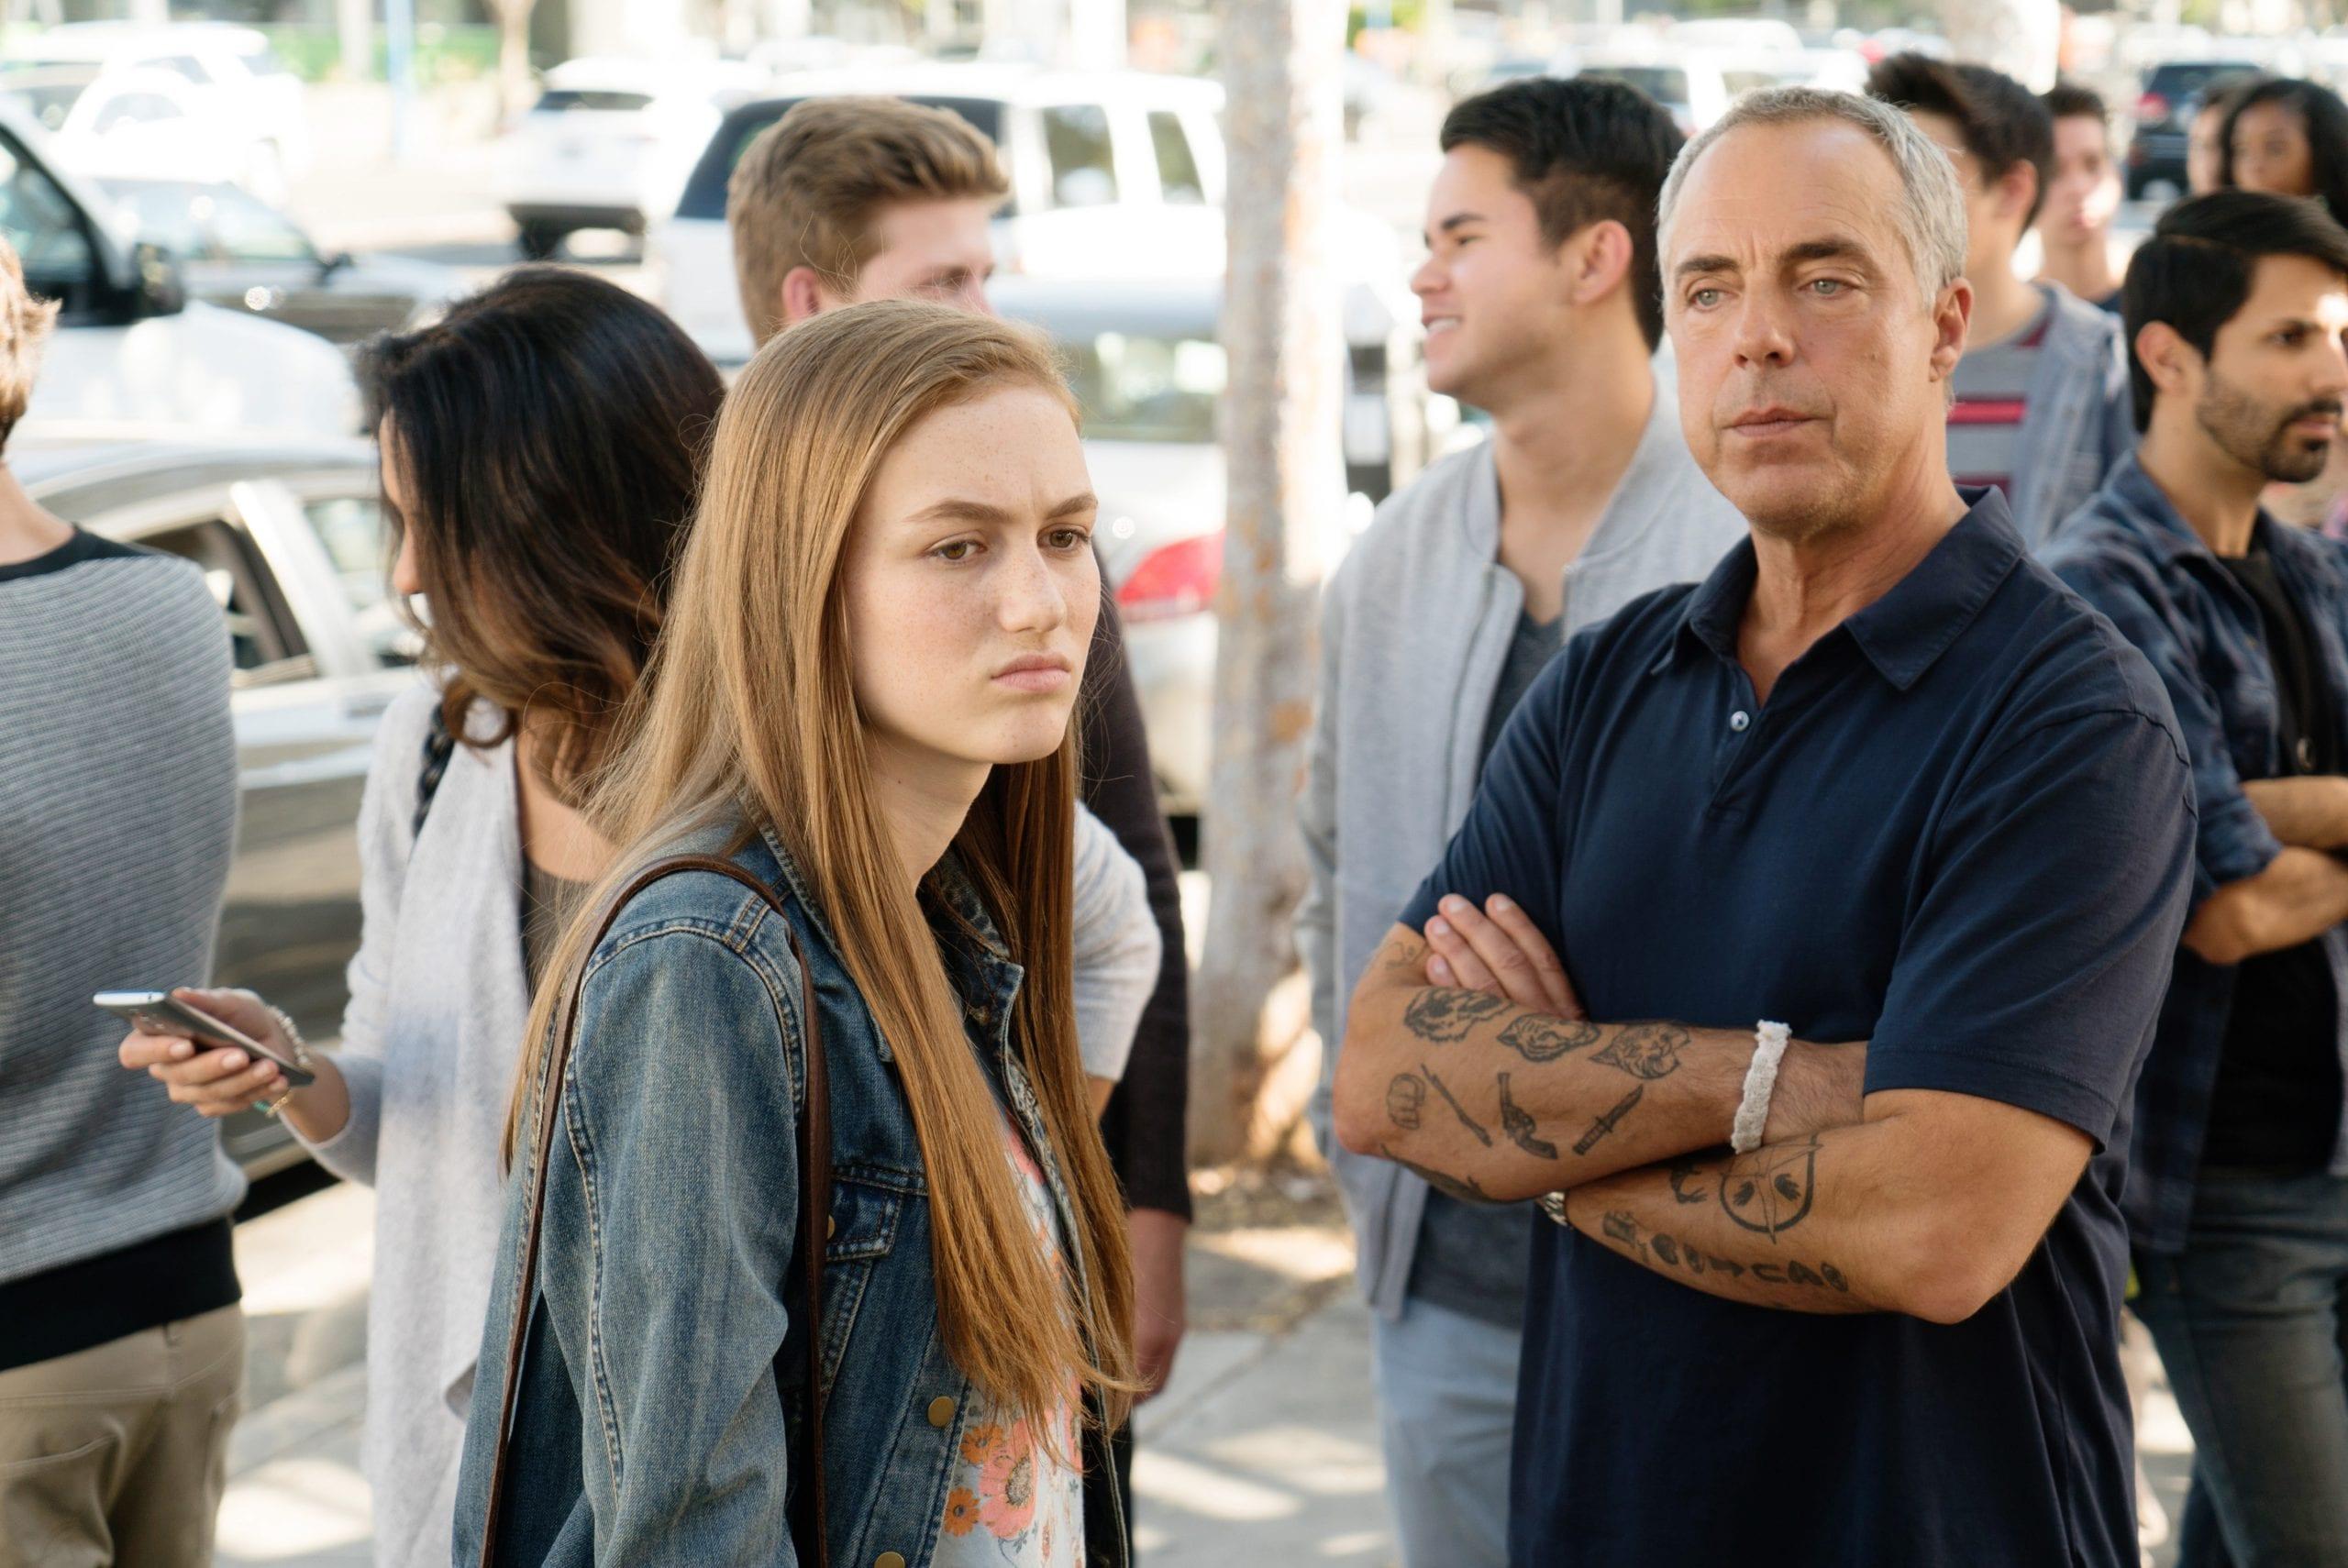 """Bosch: Season 3"" - (L to R) Madison Lintz as Maddie Bosch, Titus Welliver as Harry Bosch"